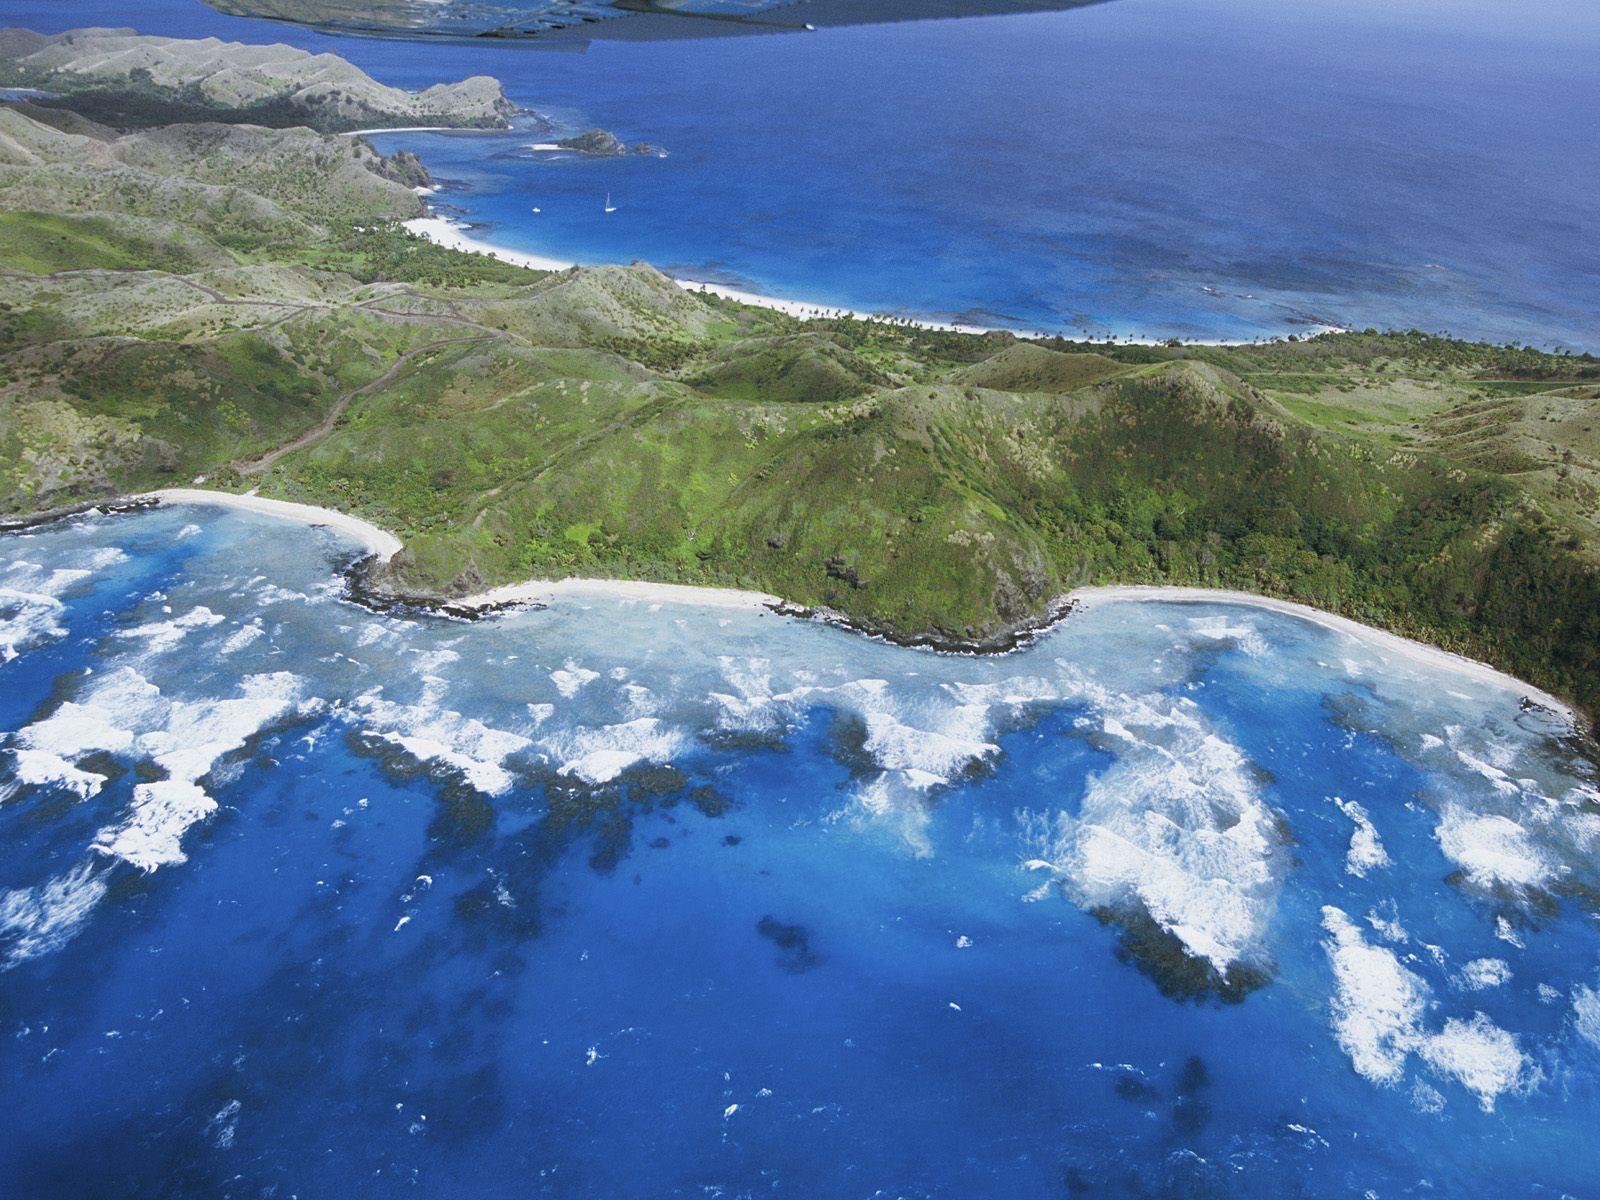 http://2.bp.blogspot.com/_V0OScaQdMy4/TNxp3HyPrdI/AAAAAAAAAW0/uFQouahb9lg/s1600/Yasawa+Islands%252C+Fiji.jpg